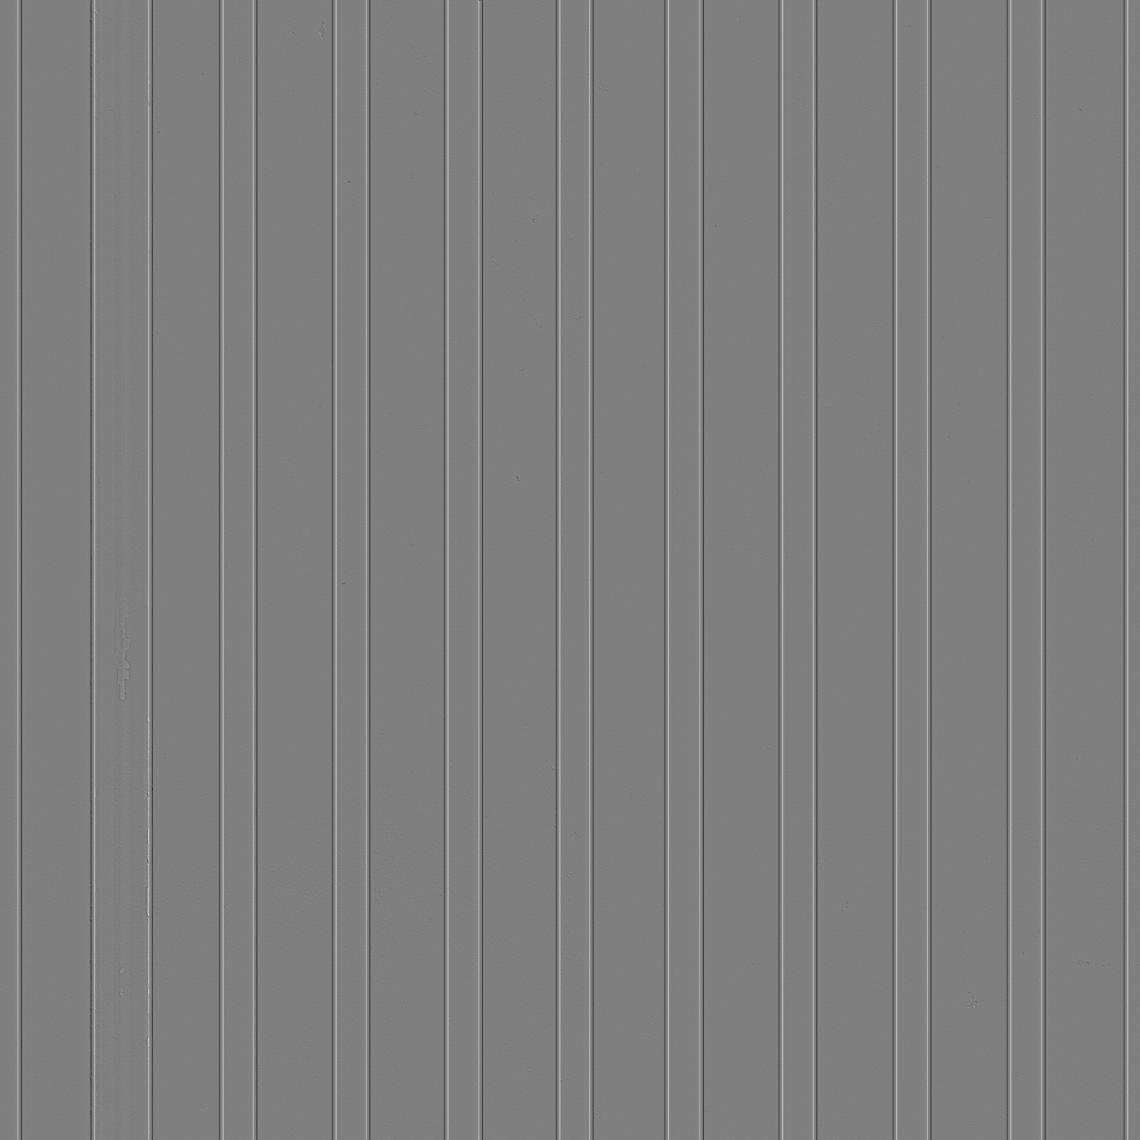 Corrugated-Metal-01-Curvature